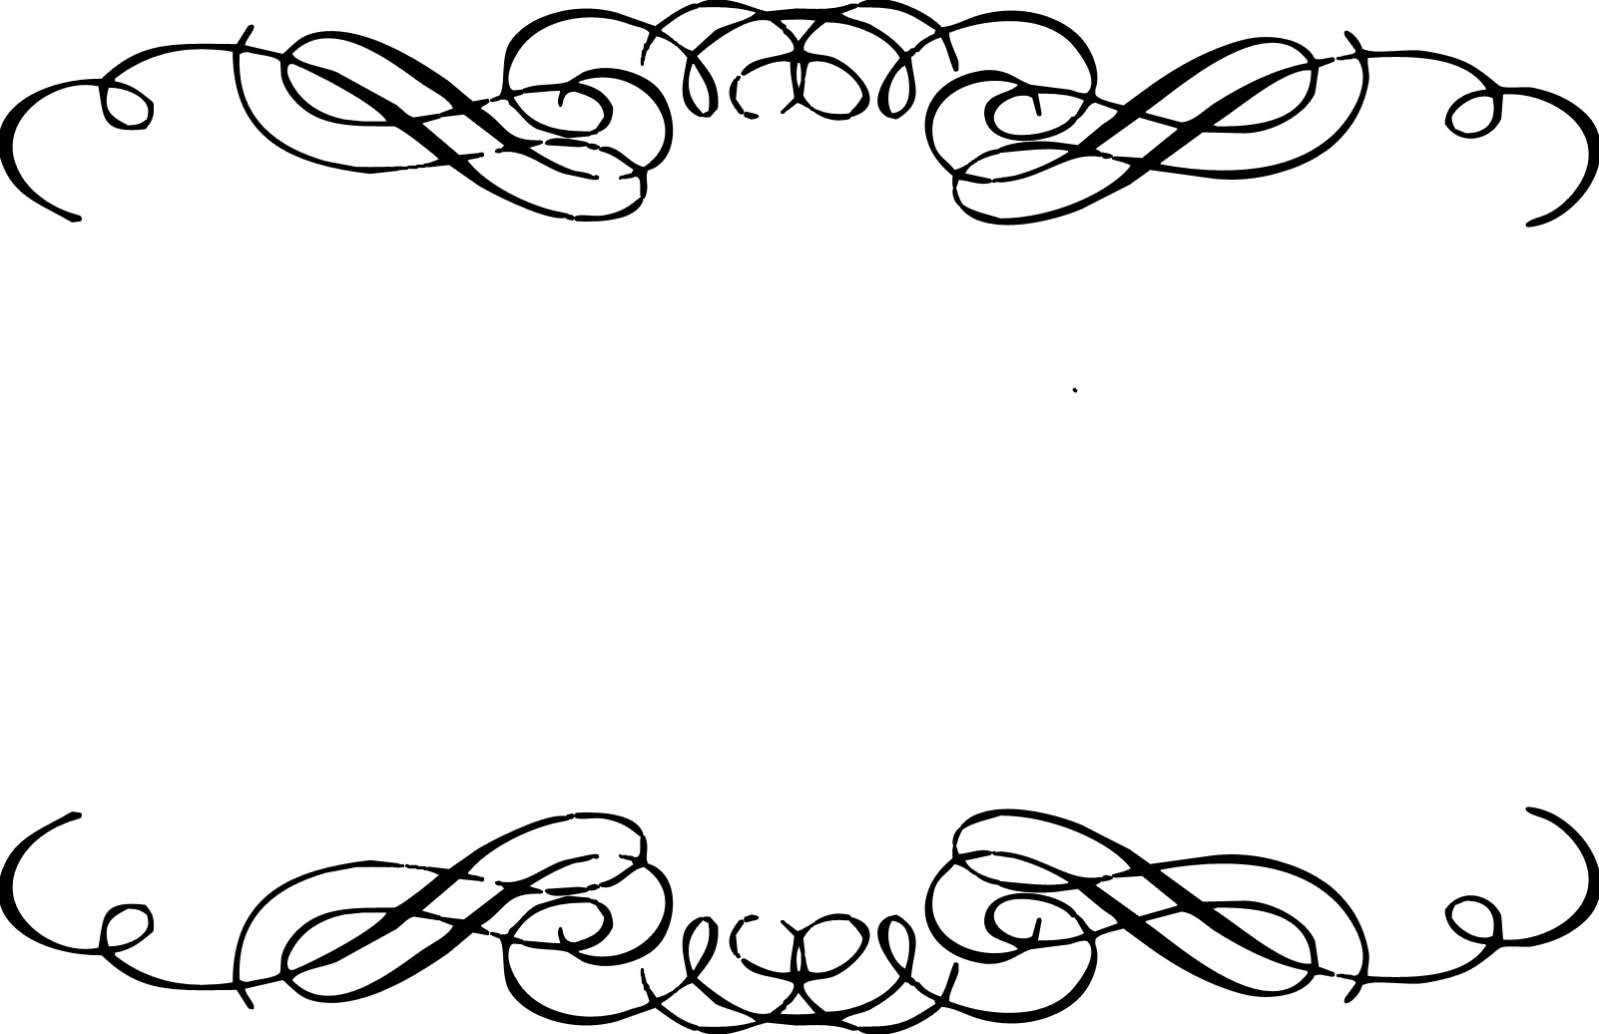 Scroll clip art 2